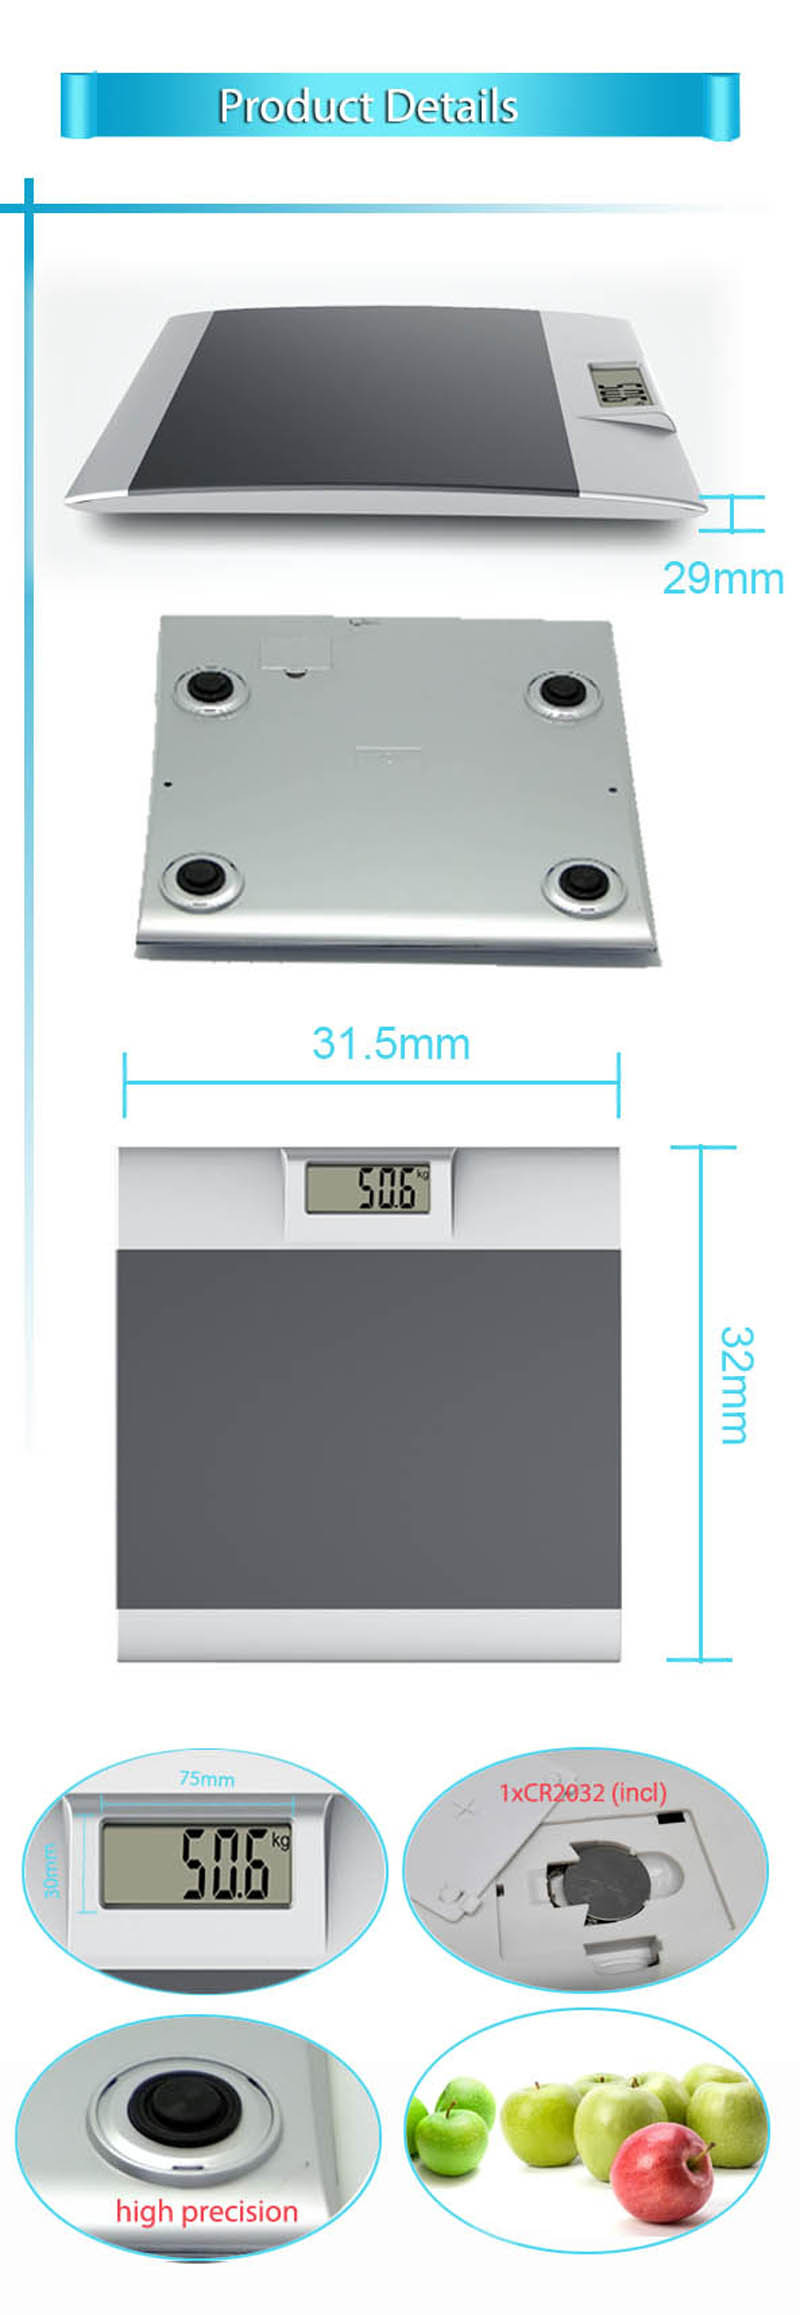 Sunny precision calibrate digital bathroom scale buy - How to calibrate a bathroom scale ...